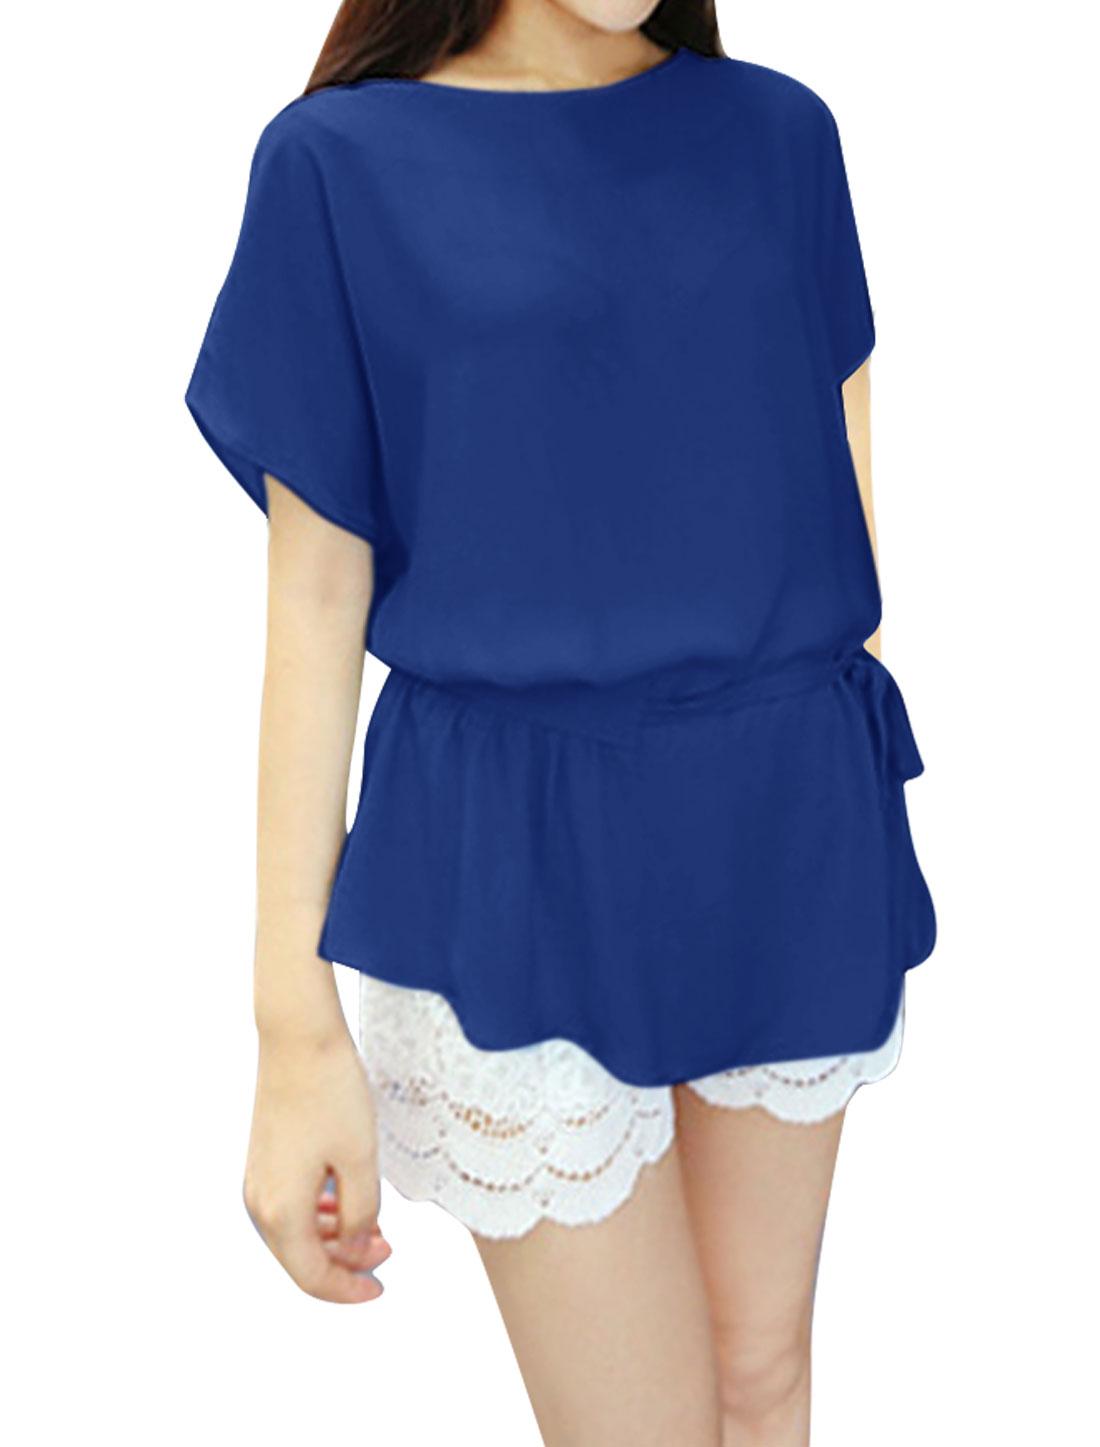 Women Batwing Sleeve Semi Sheer Summer Blouse Royal Blue M